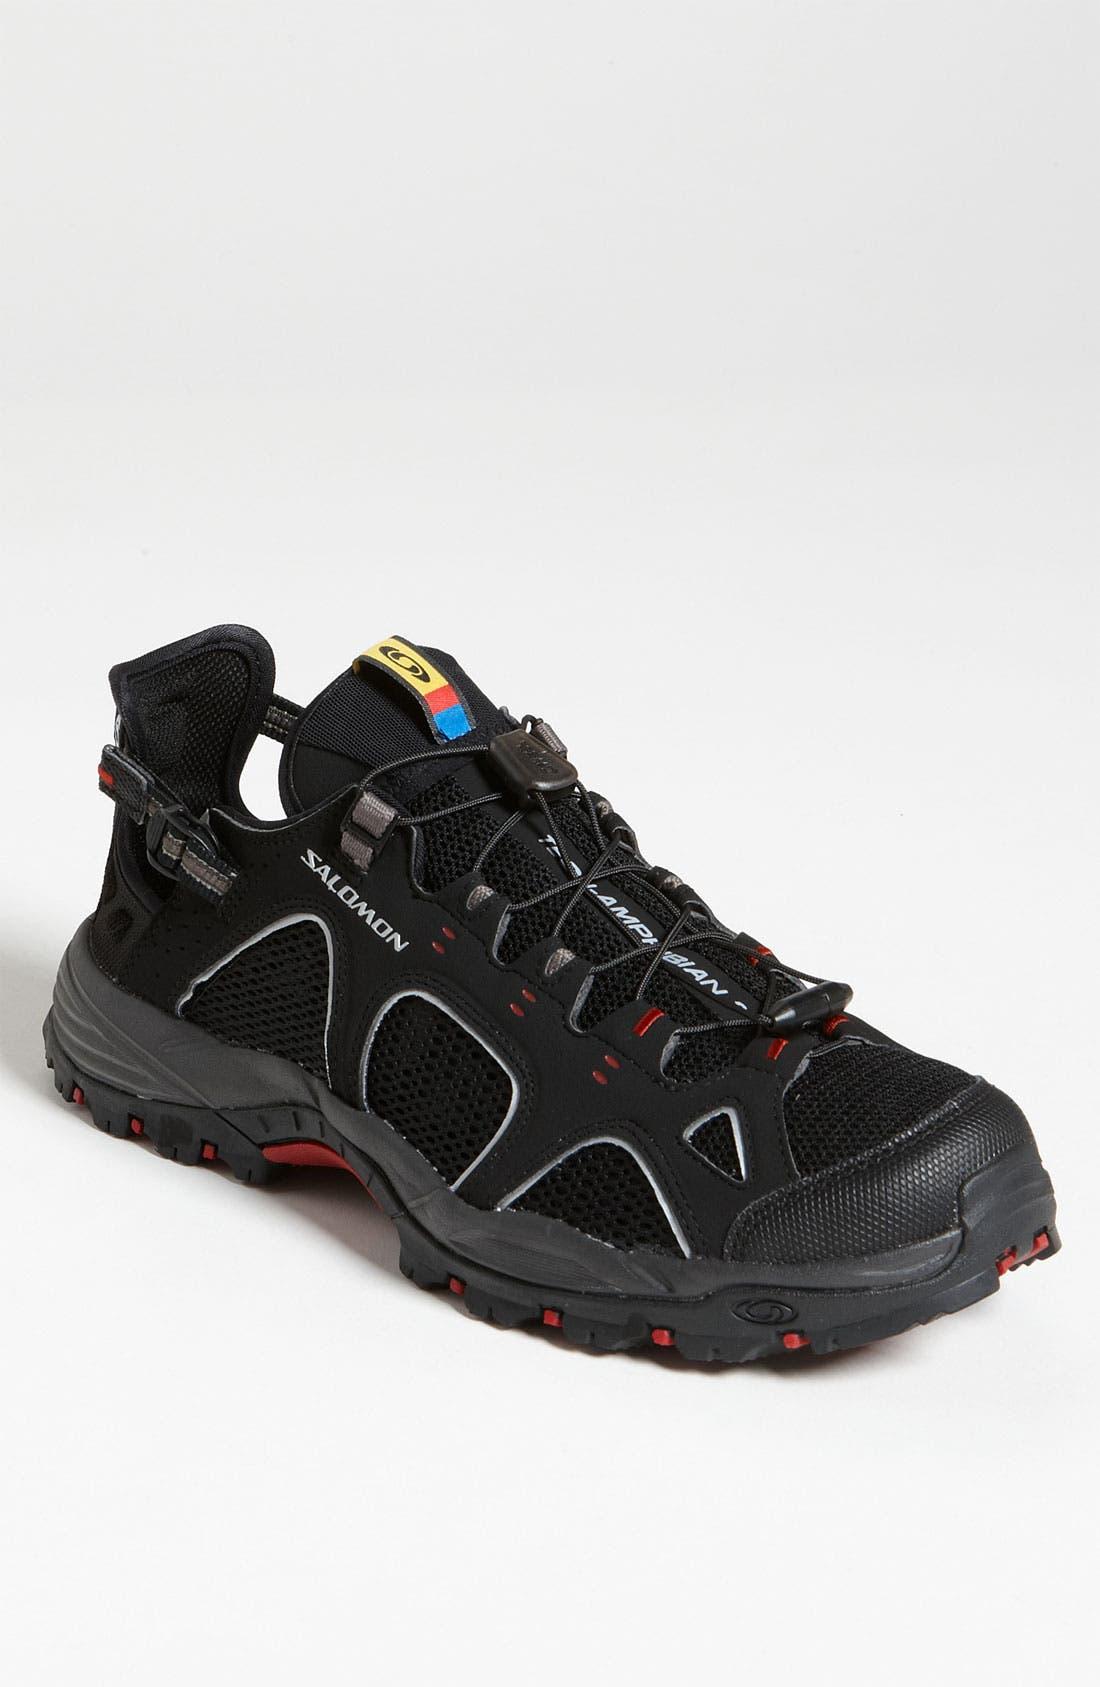 Main Image - Salomon 'Techamphibian 3' Hiking Shoe (Men)